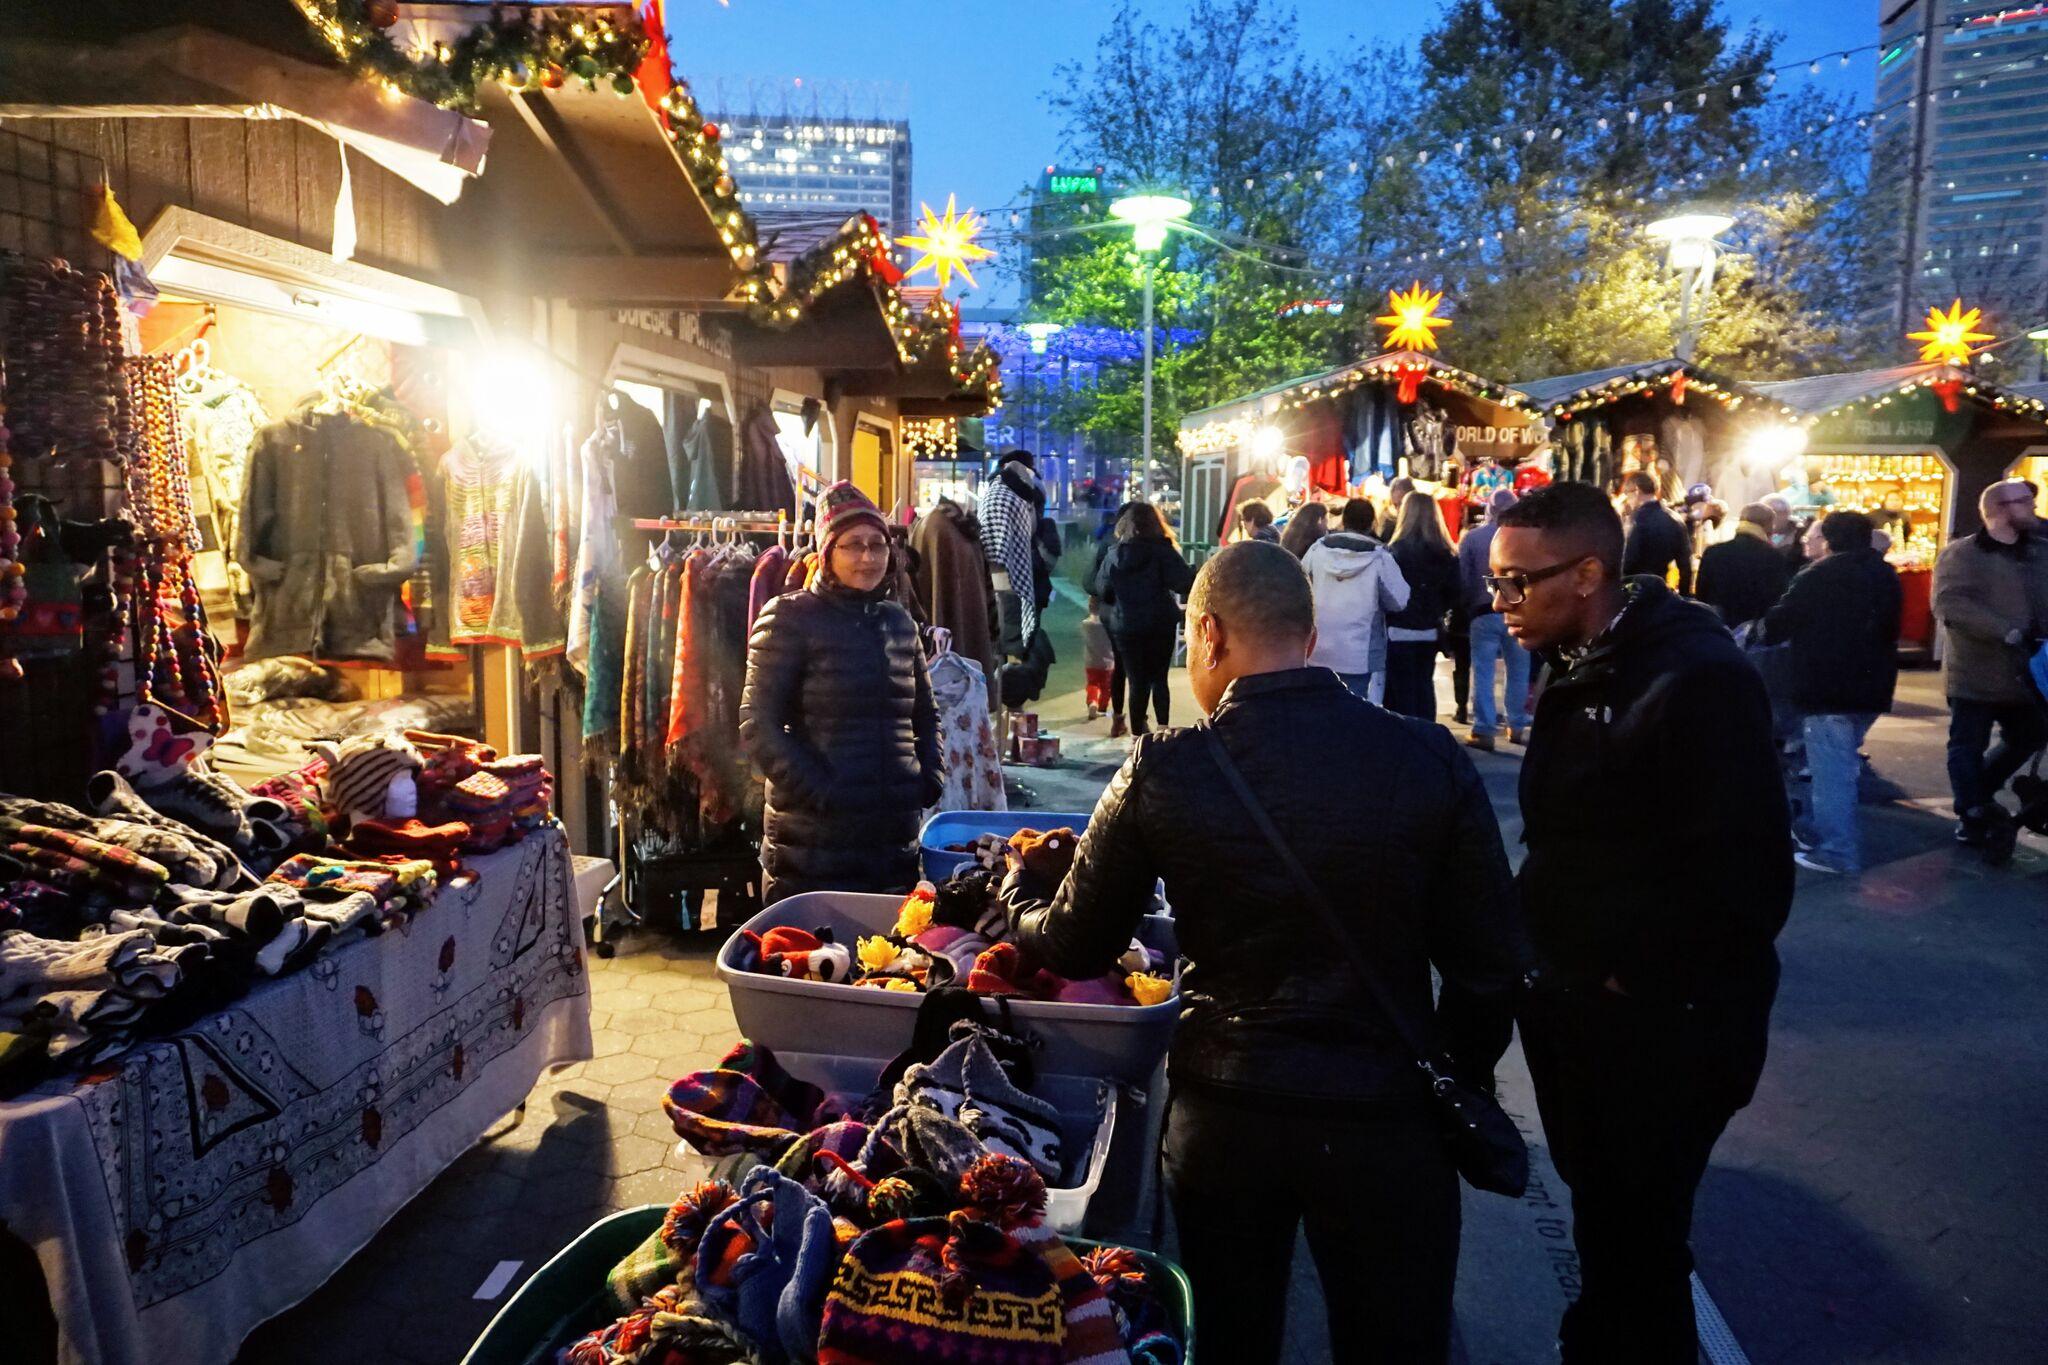 Christmas Village Baltimore Last Minute Shopping